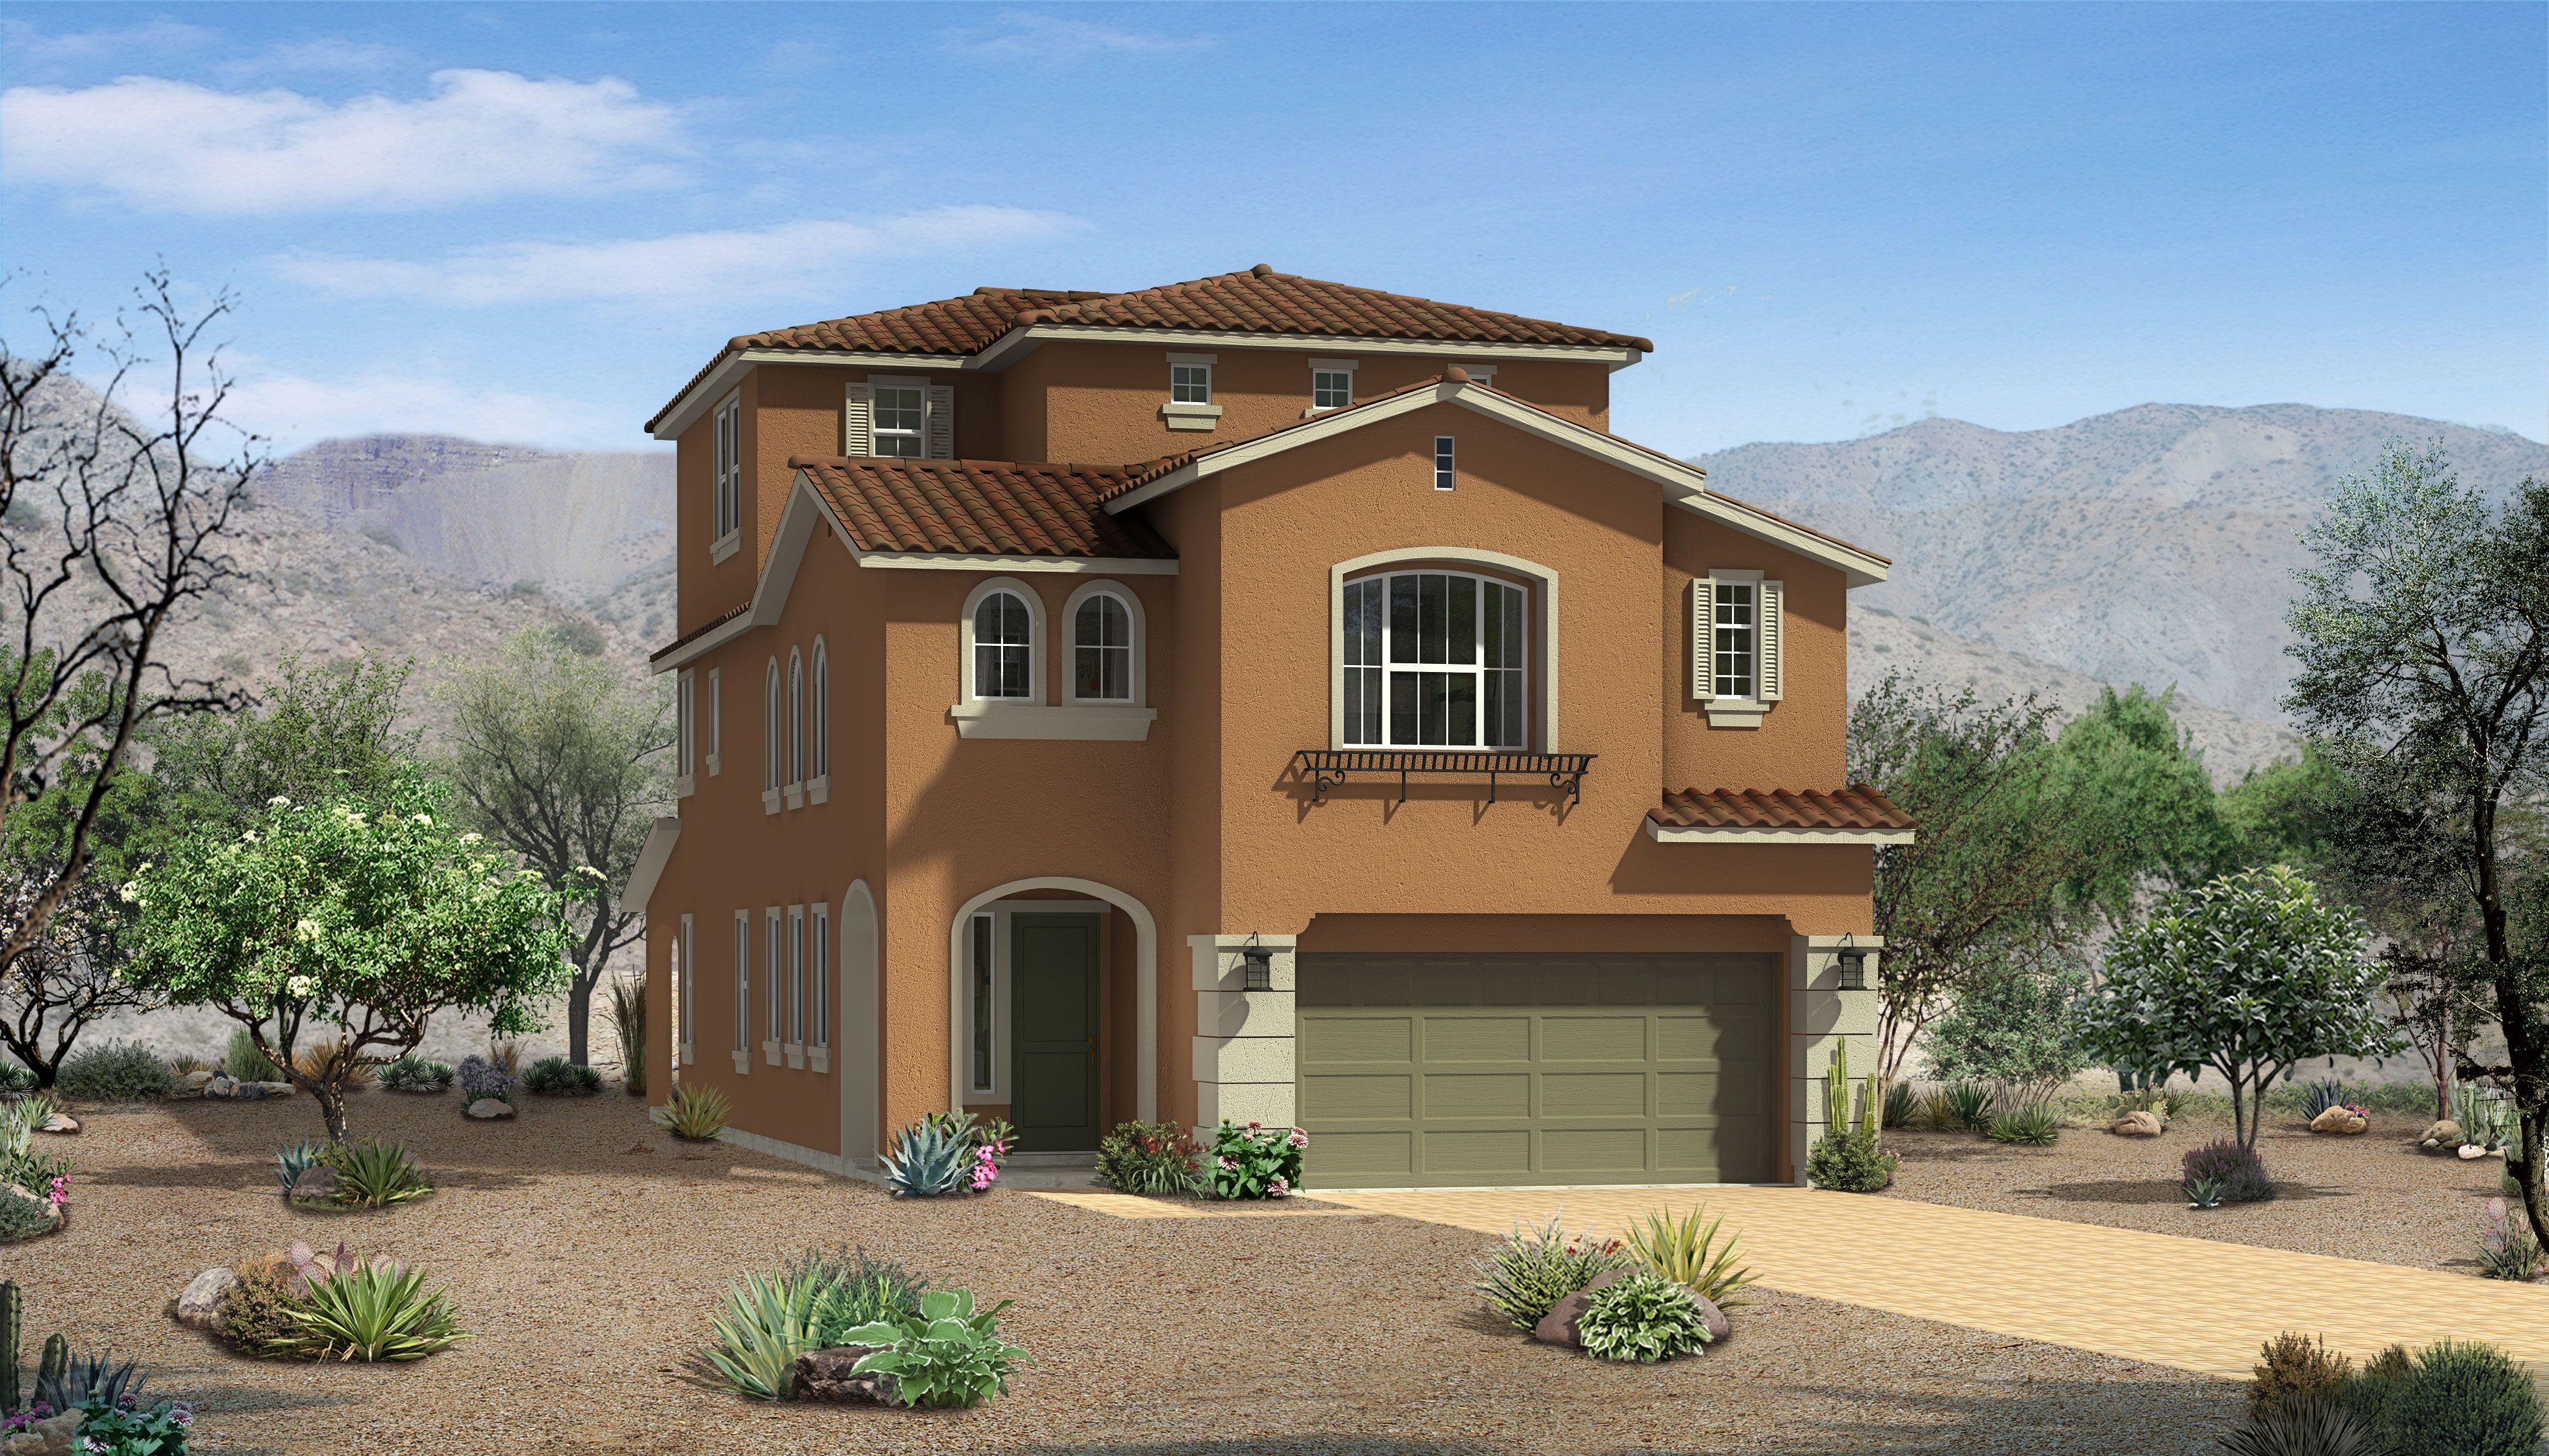 Model homes image by Skye Canyon on Woodside Model Homes